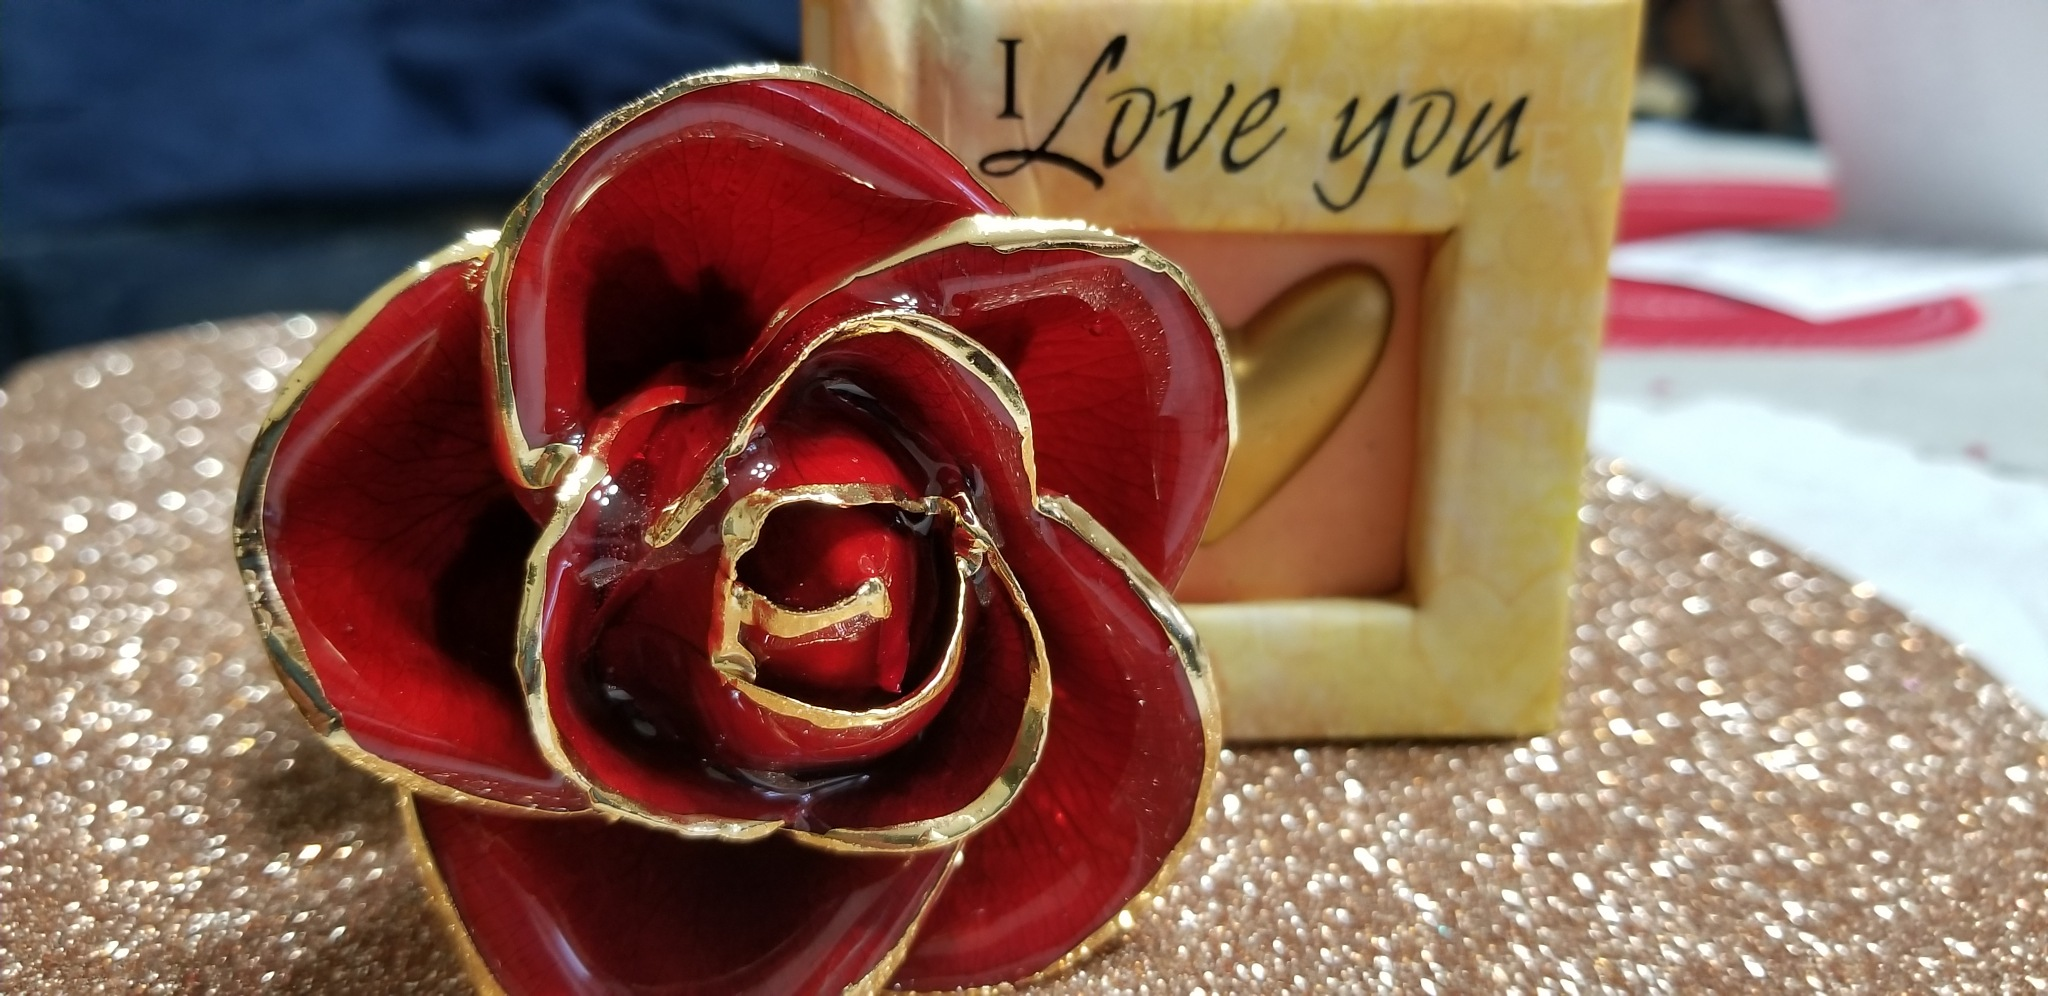 Wishing everybody a very Happy Valentine's day  by denise.bouvier.3